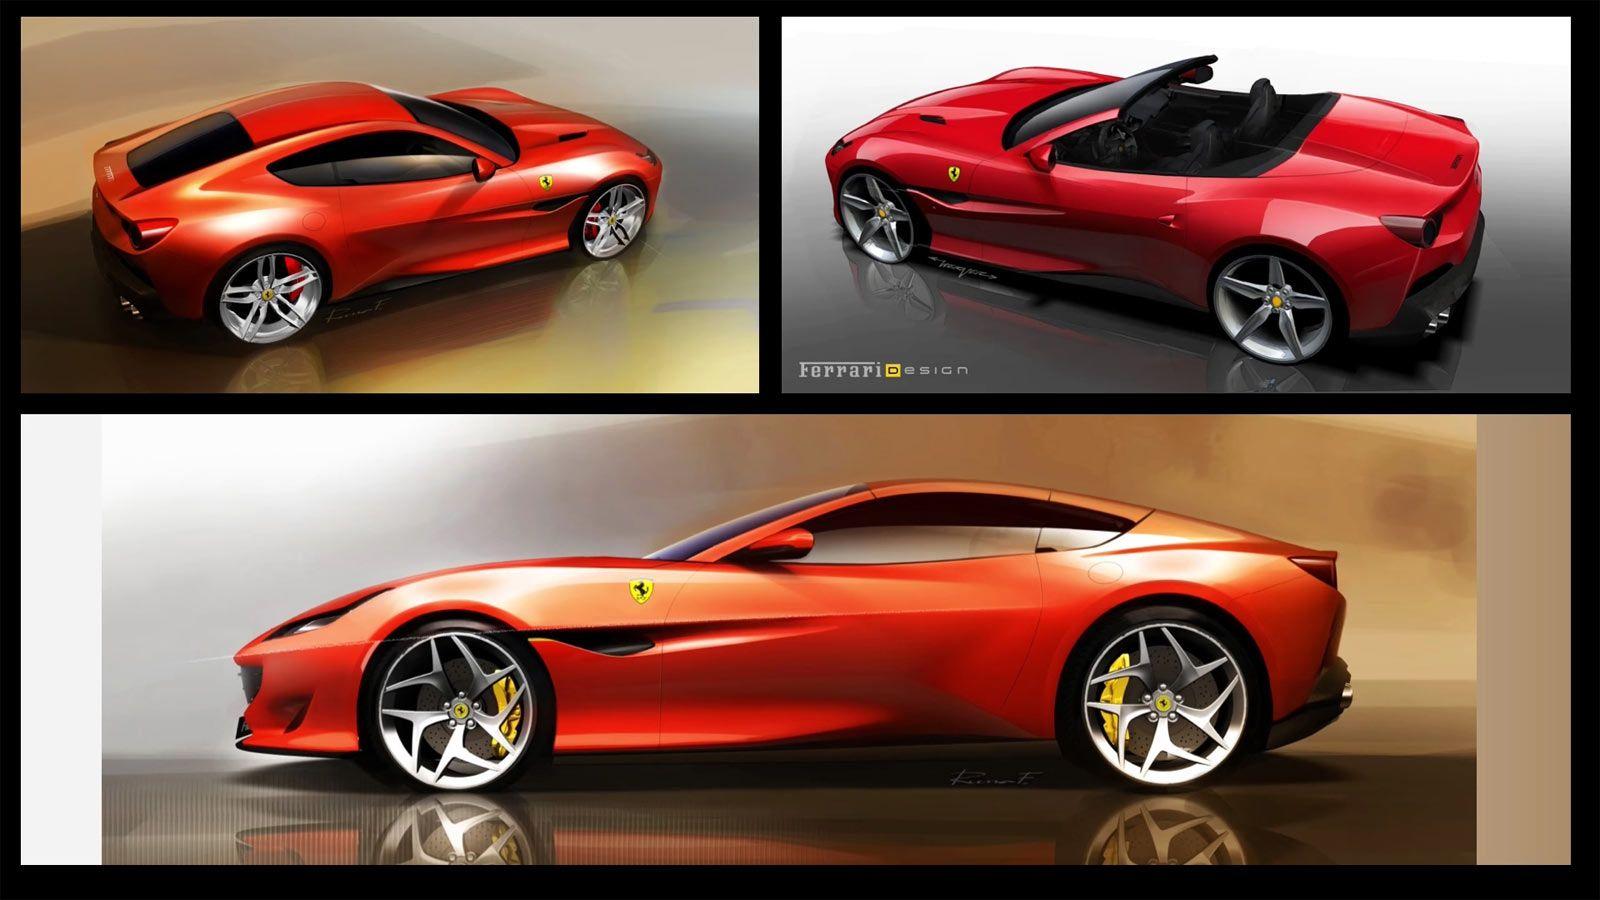 Ferrari Enzo picture # 74 of 76, Design Sketches, MY 2002 ... |Ferrari Design Sketches